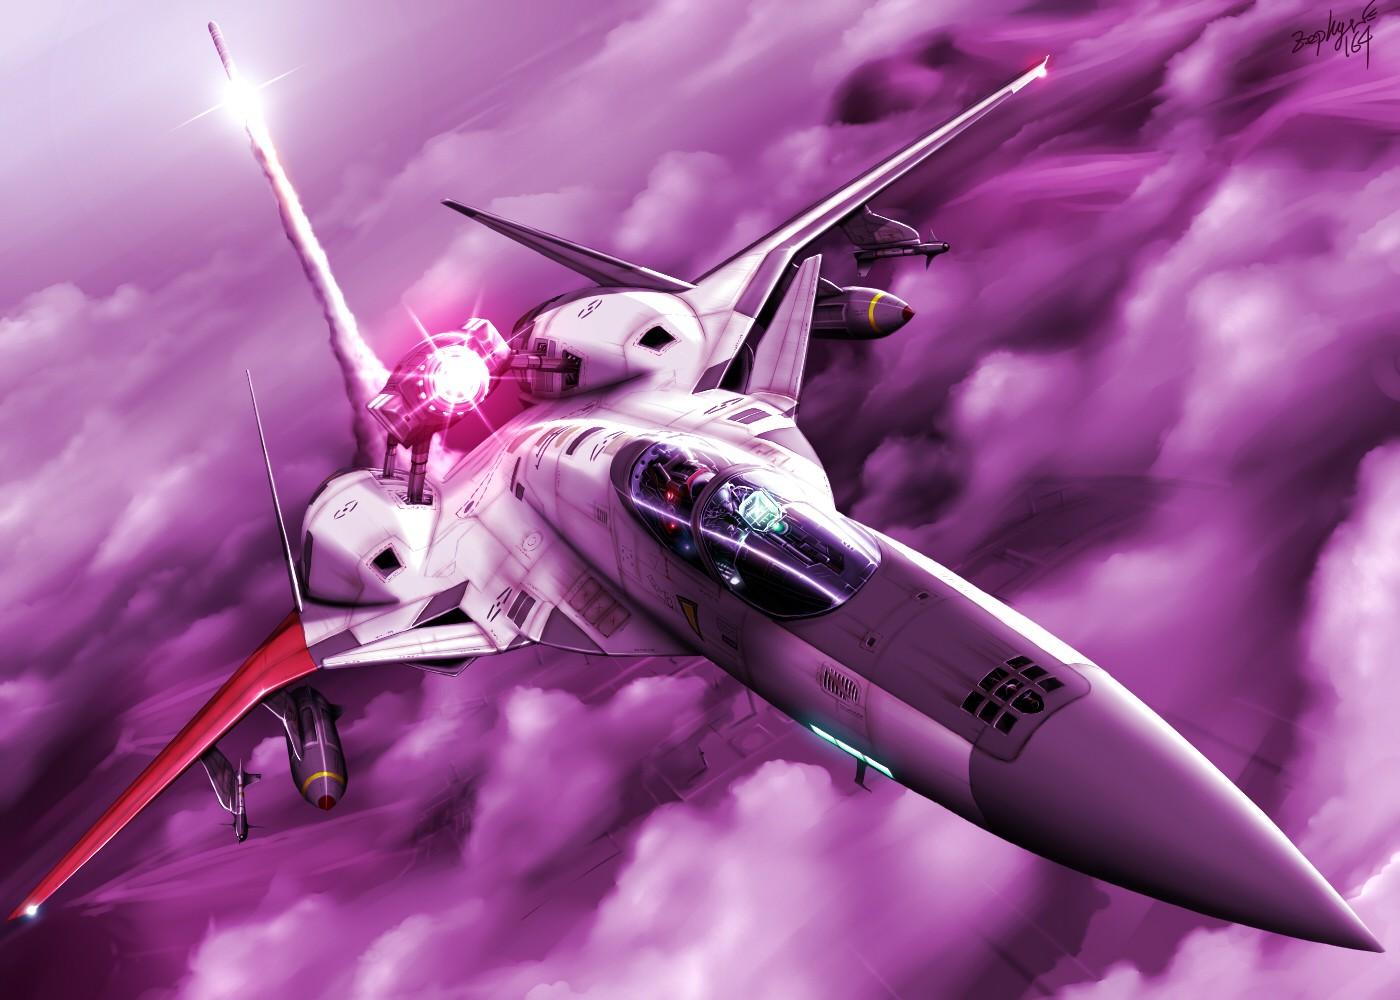 Ace Combat Wallpaper 18416   Wallpaperesque 1400x1000